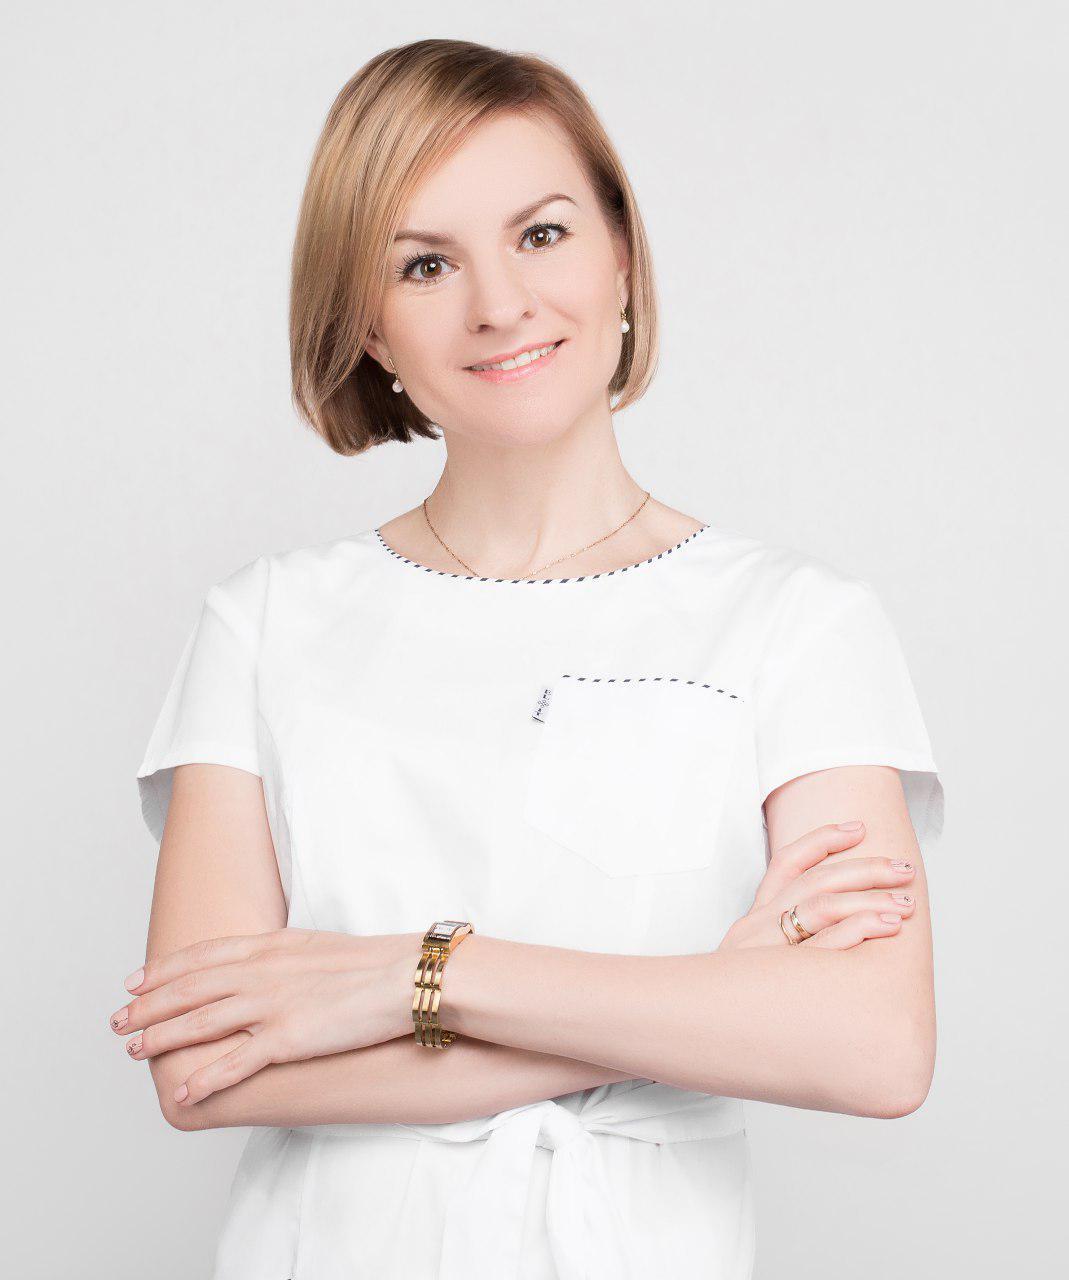 Четверикова Марина Анатольевна